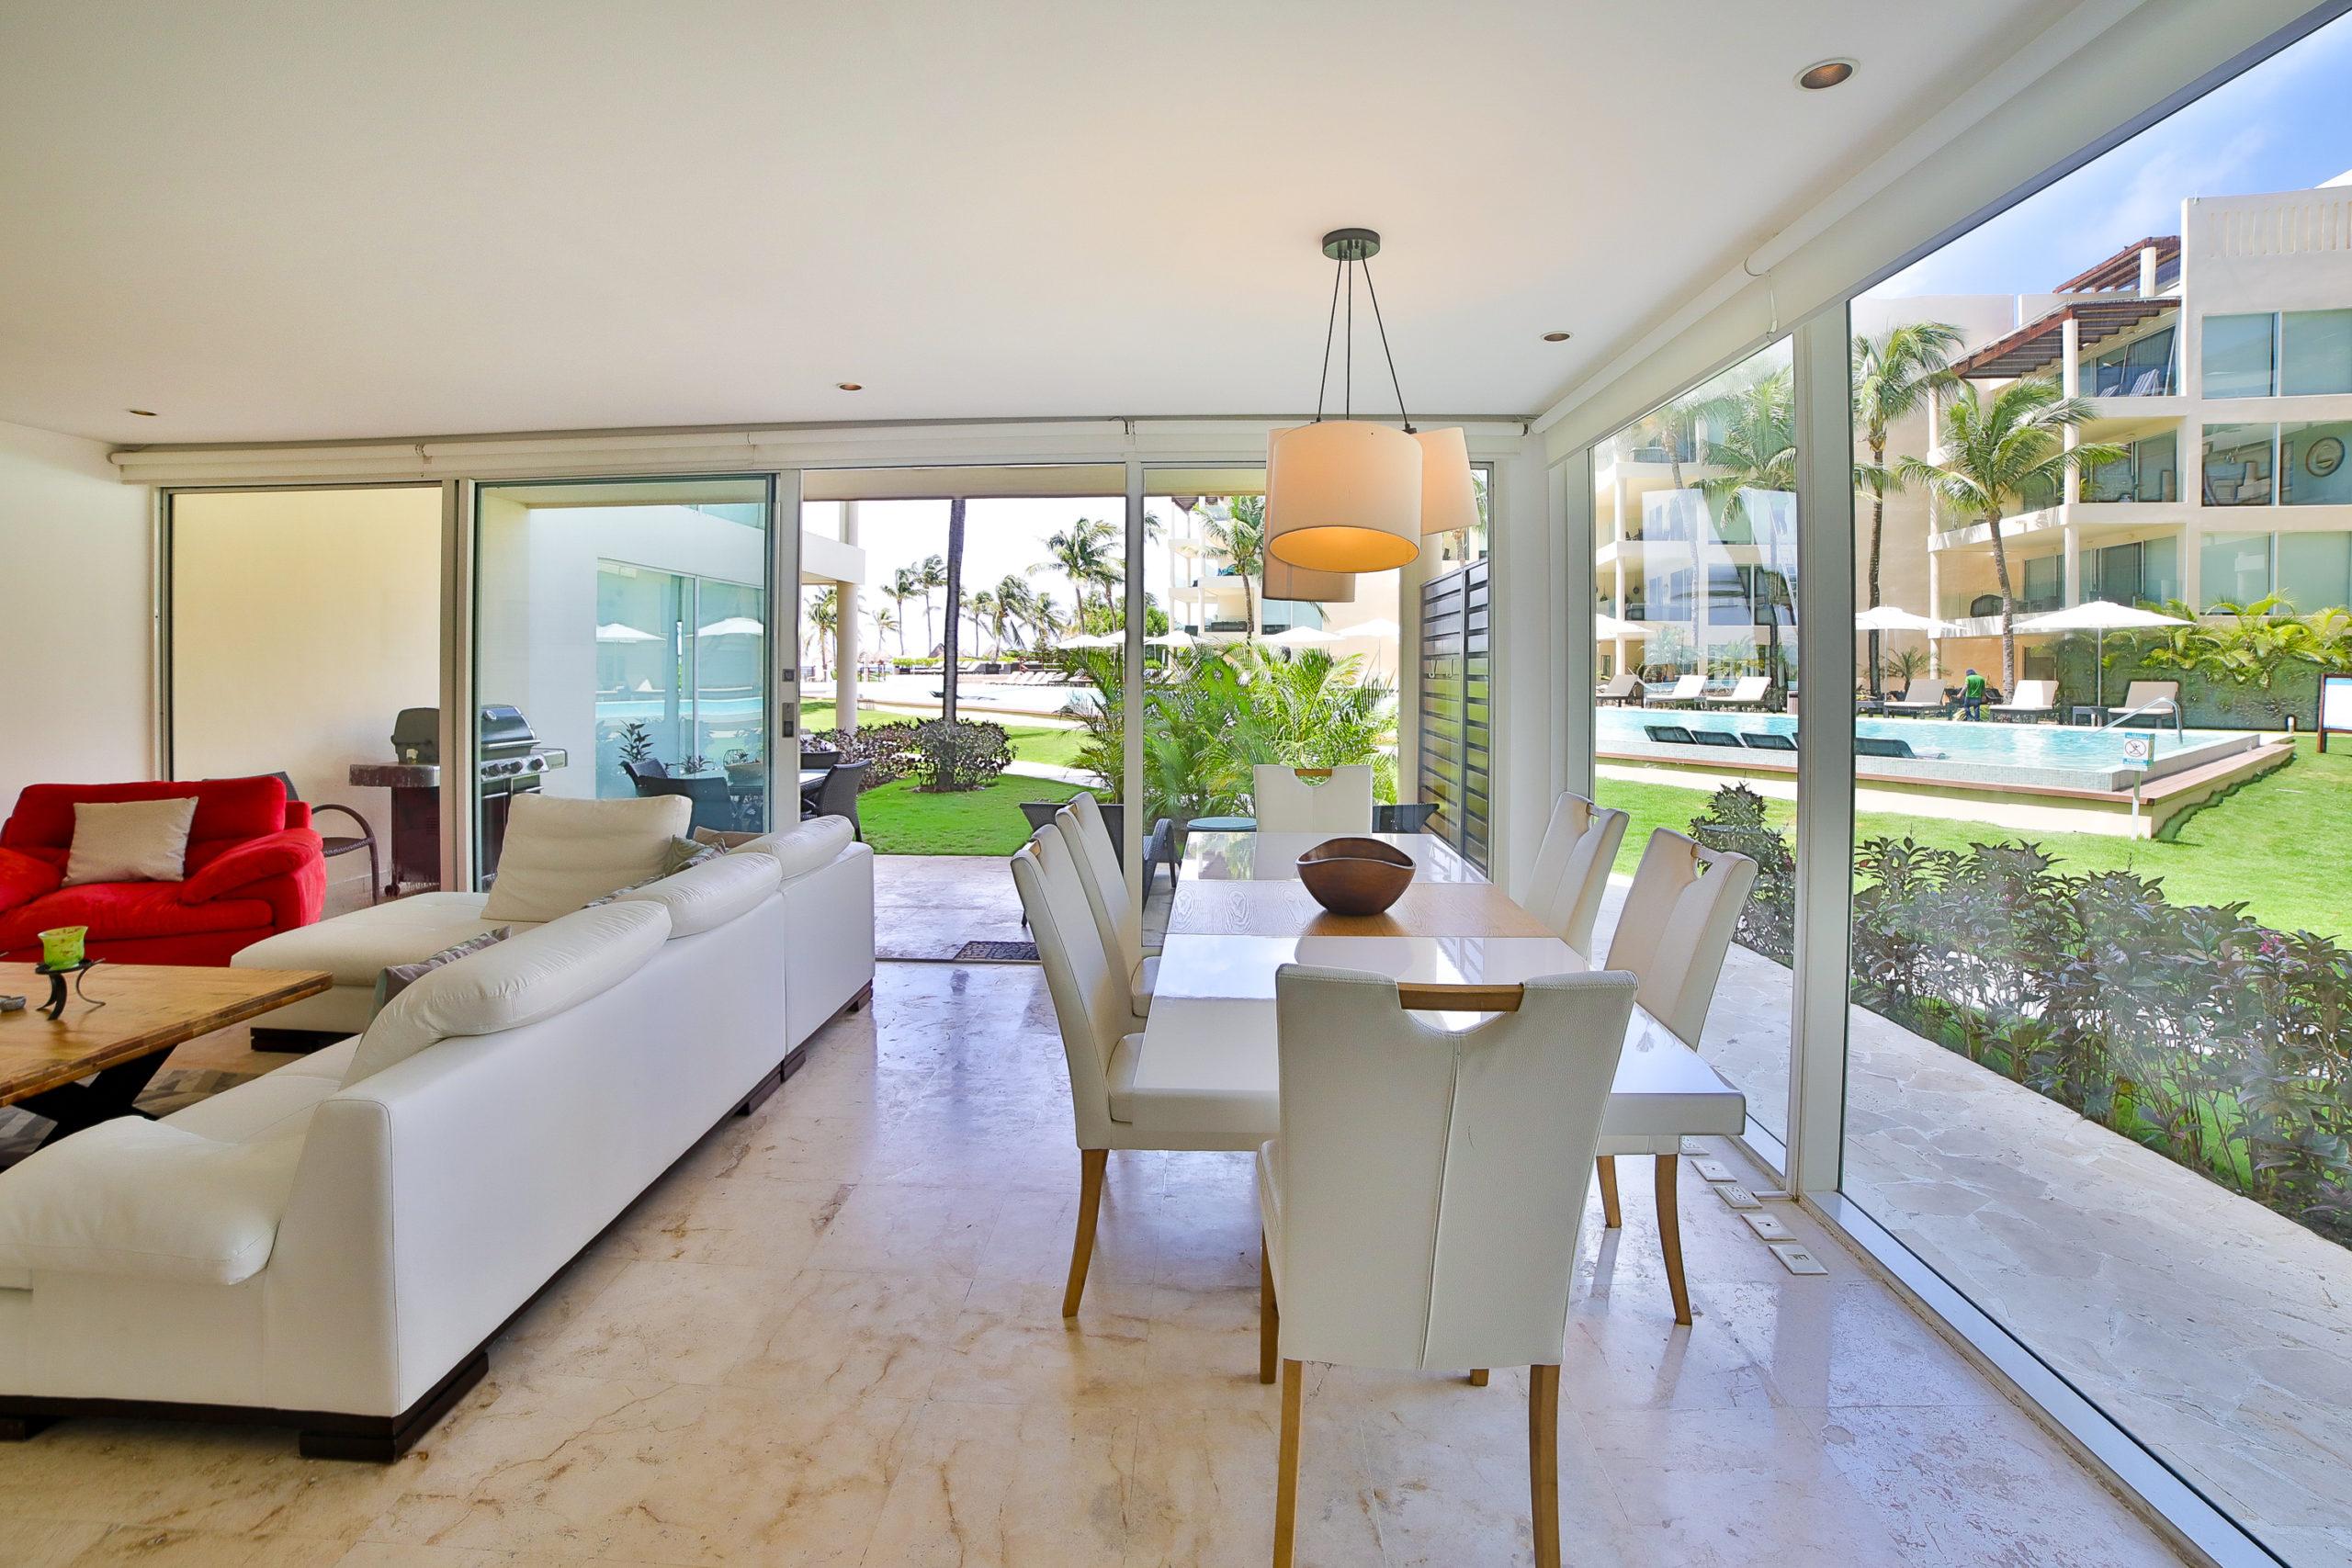 Beachfront 2 bedroom condo in Playa del Carmen